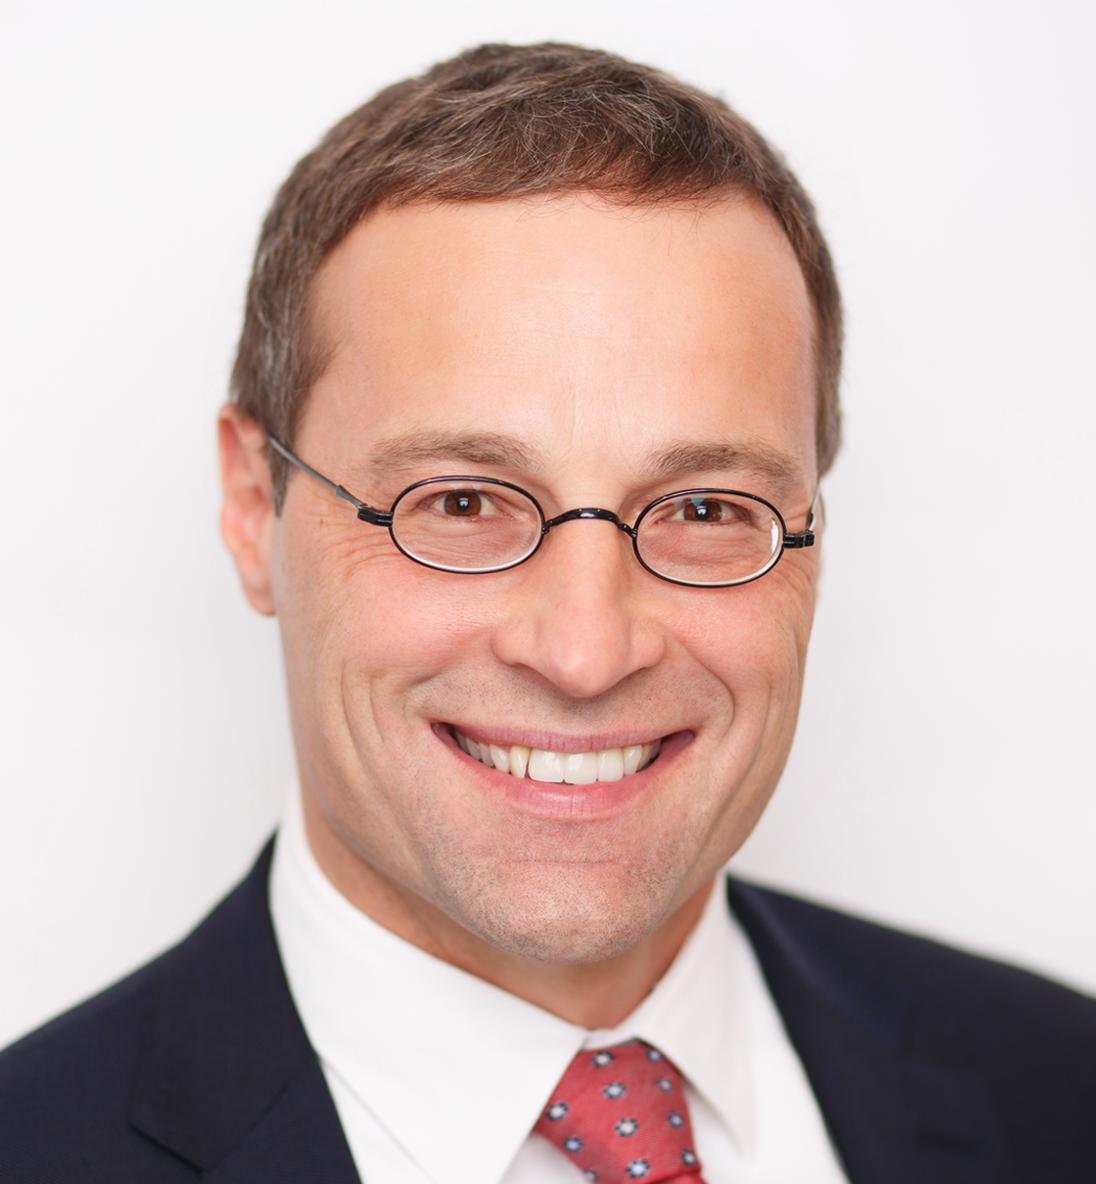 David Istvan, MD